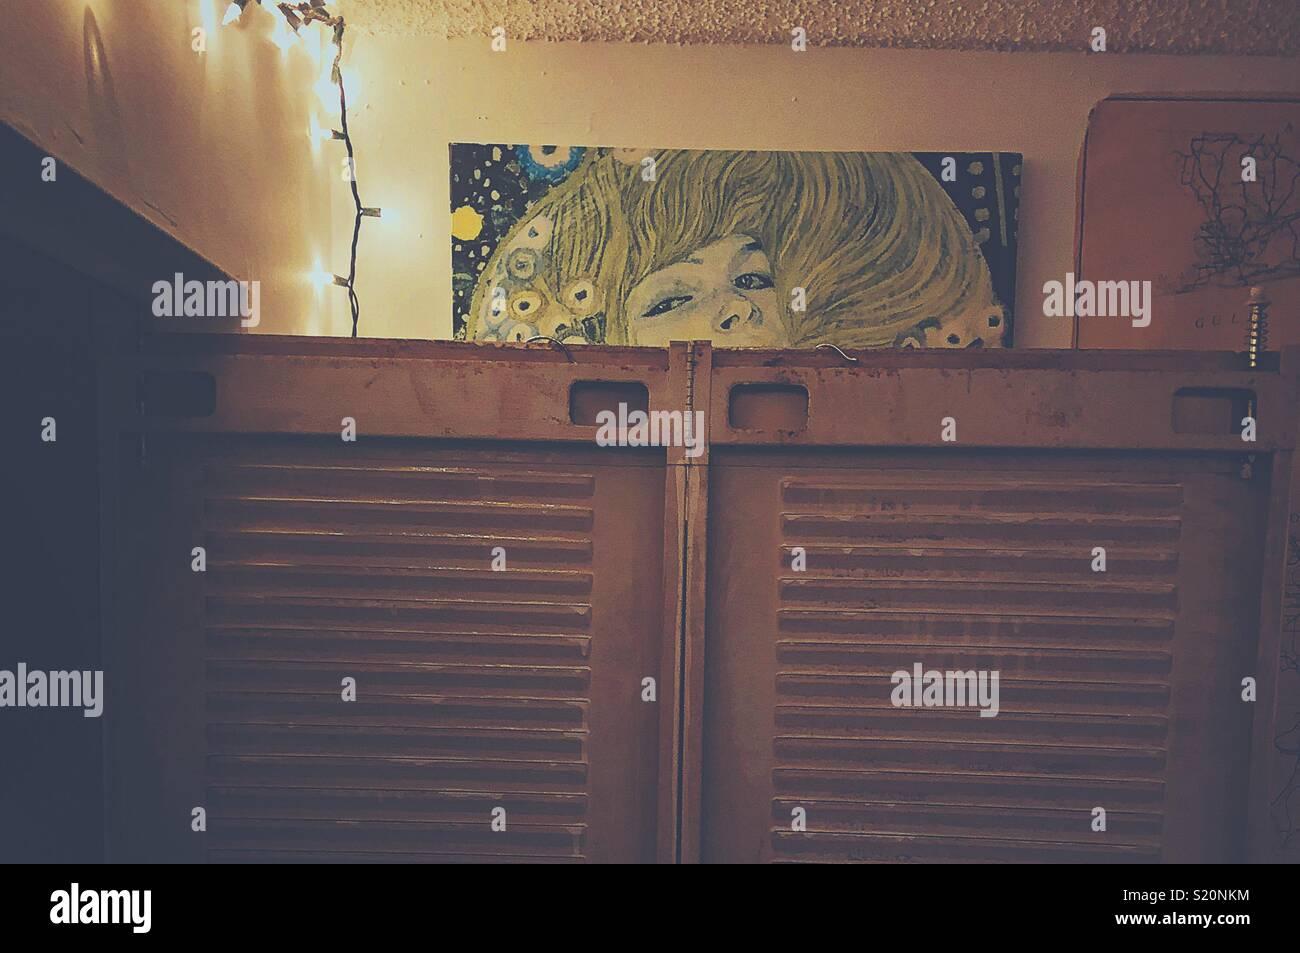 Klimt Glimpse - Stock Image